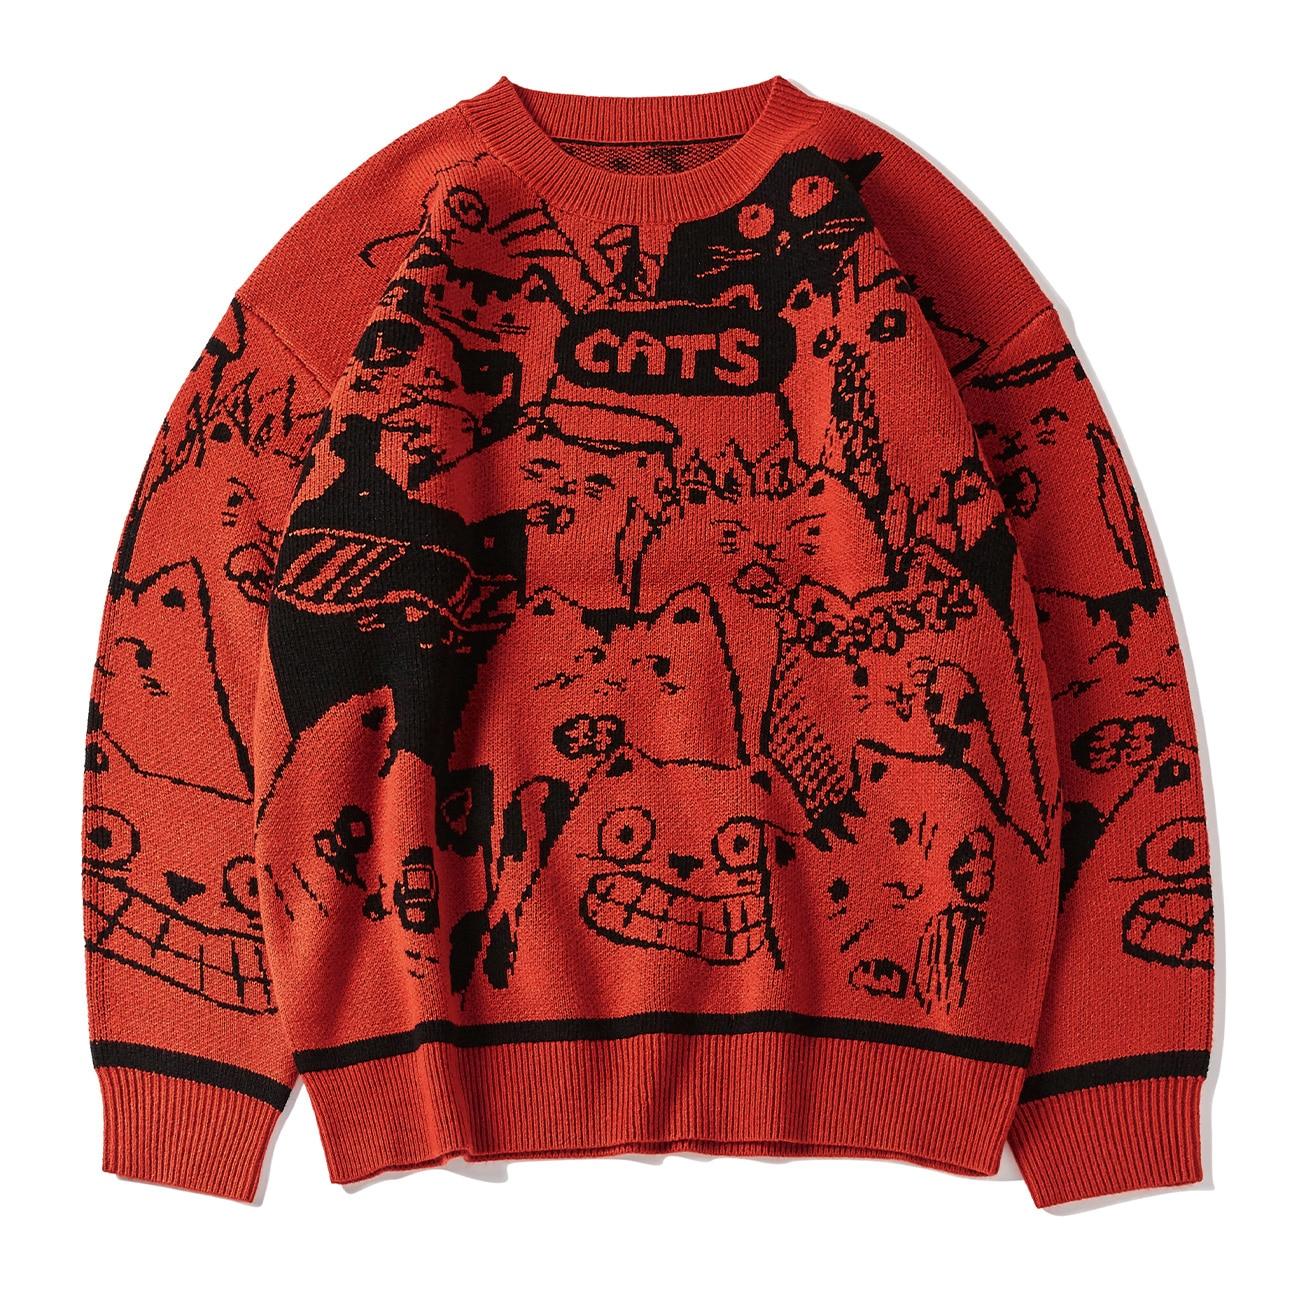 Hip Hop Streetwear Knitted Sweater Men 2021 Cartoon Cats Print Harajuku Sweater Oversize Cotton Loose Pullover Men Clothing Blue